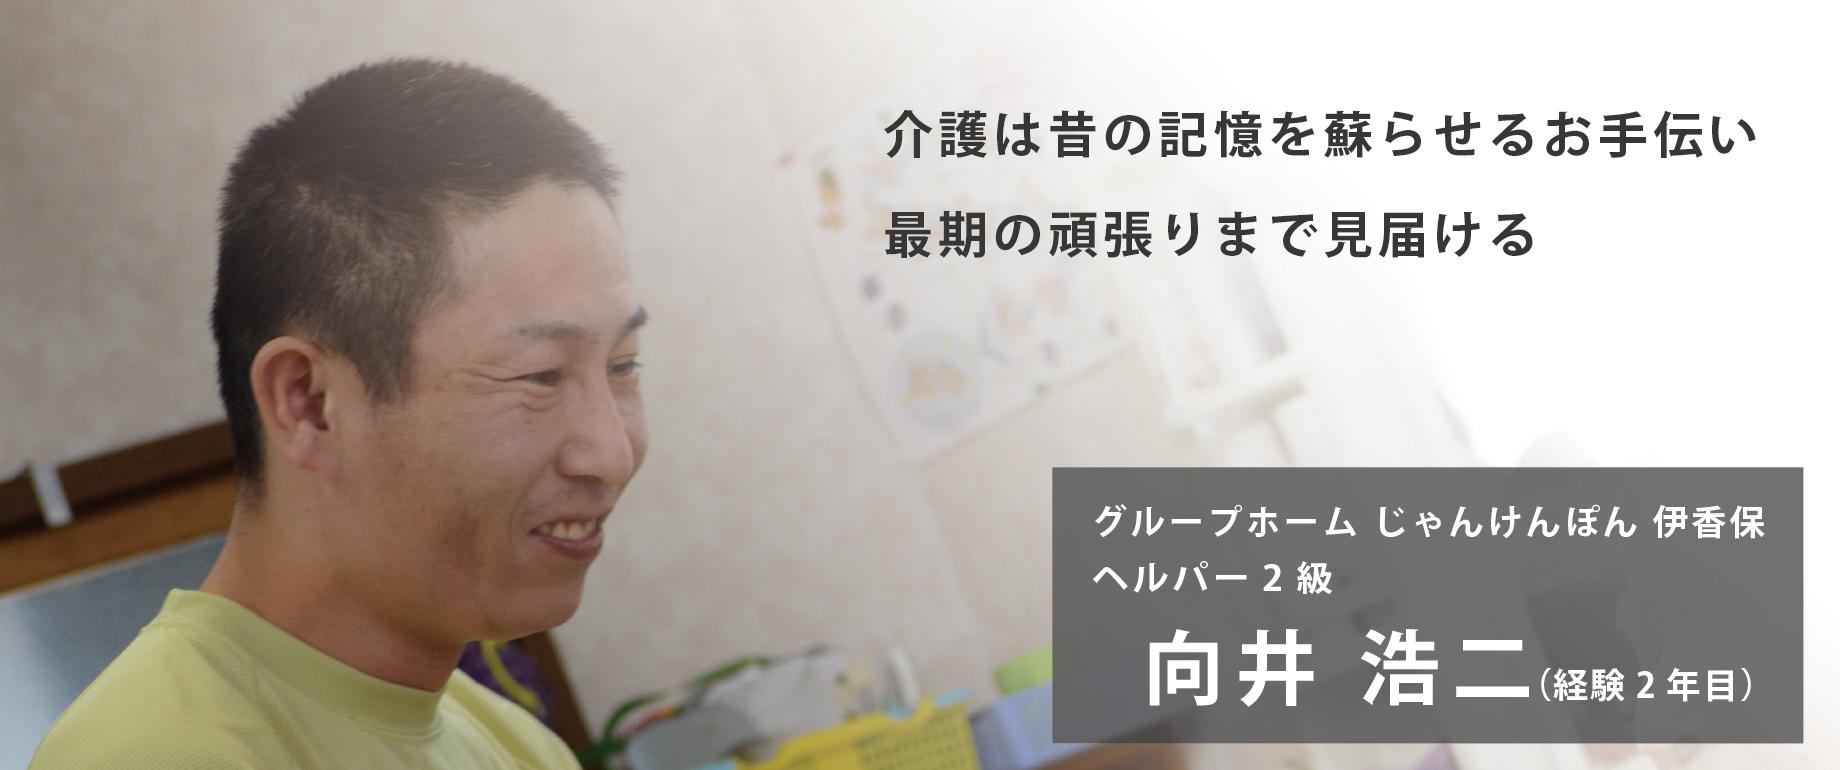 04_mukai1